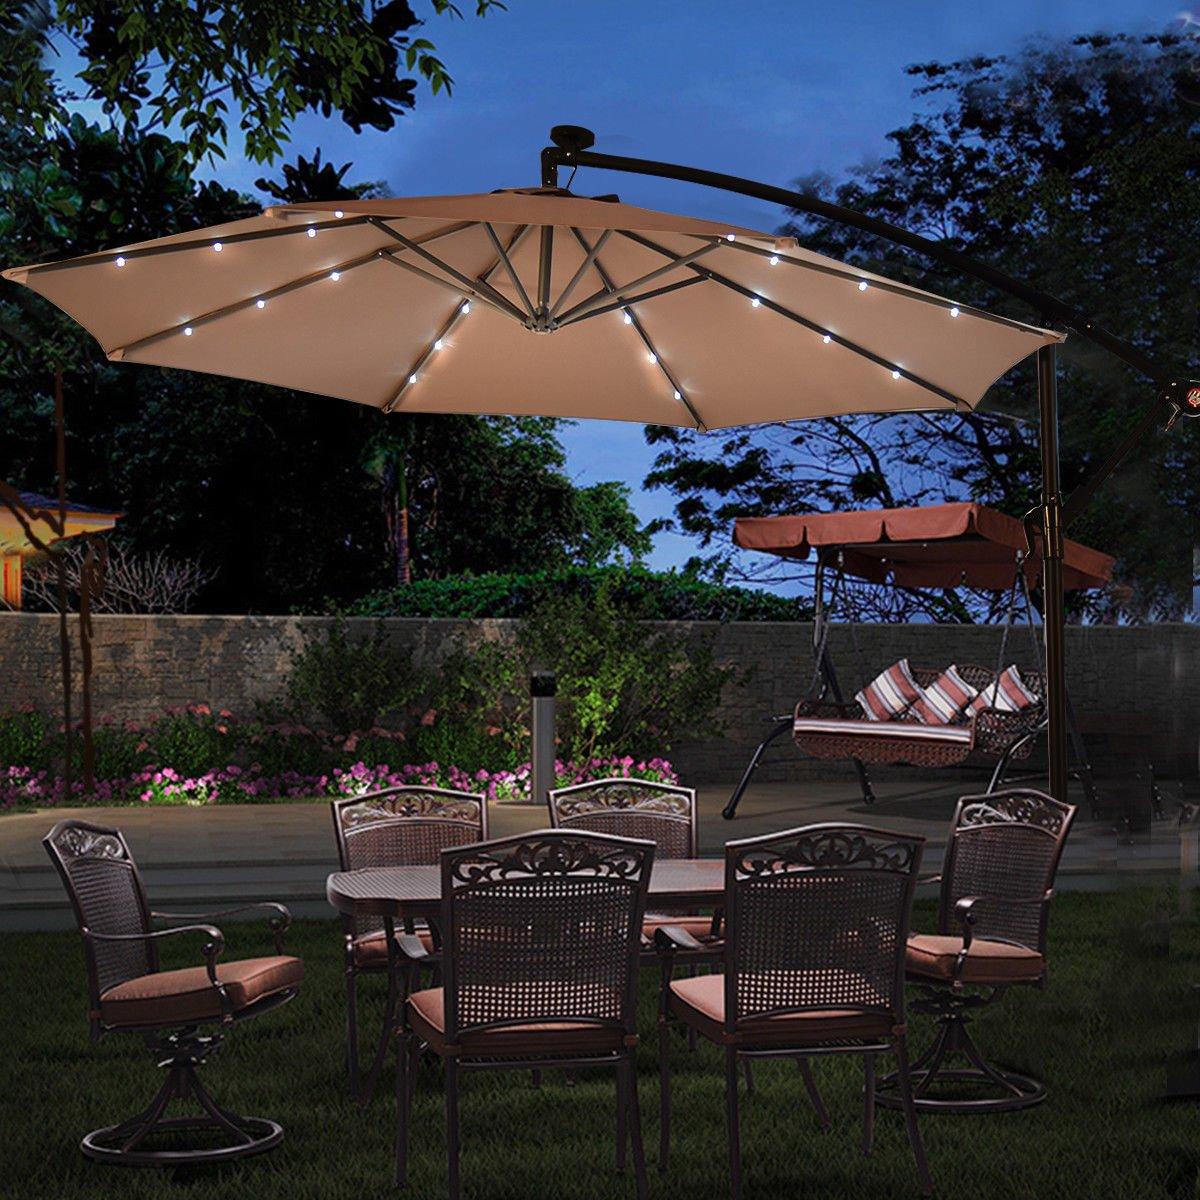 TANGKULA 10FT Outdoor Patio Umbrella Solar LED Lighted Sun Shade Market Umbrella Hanging Cover Cross Base by TANGKULA